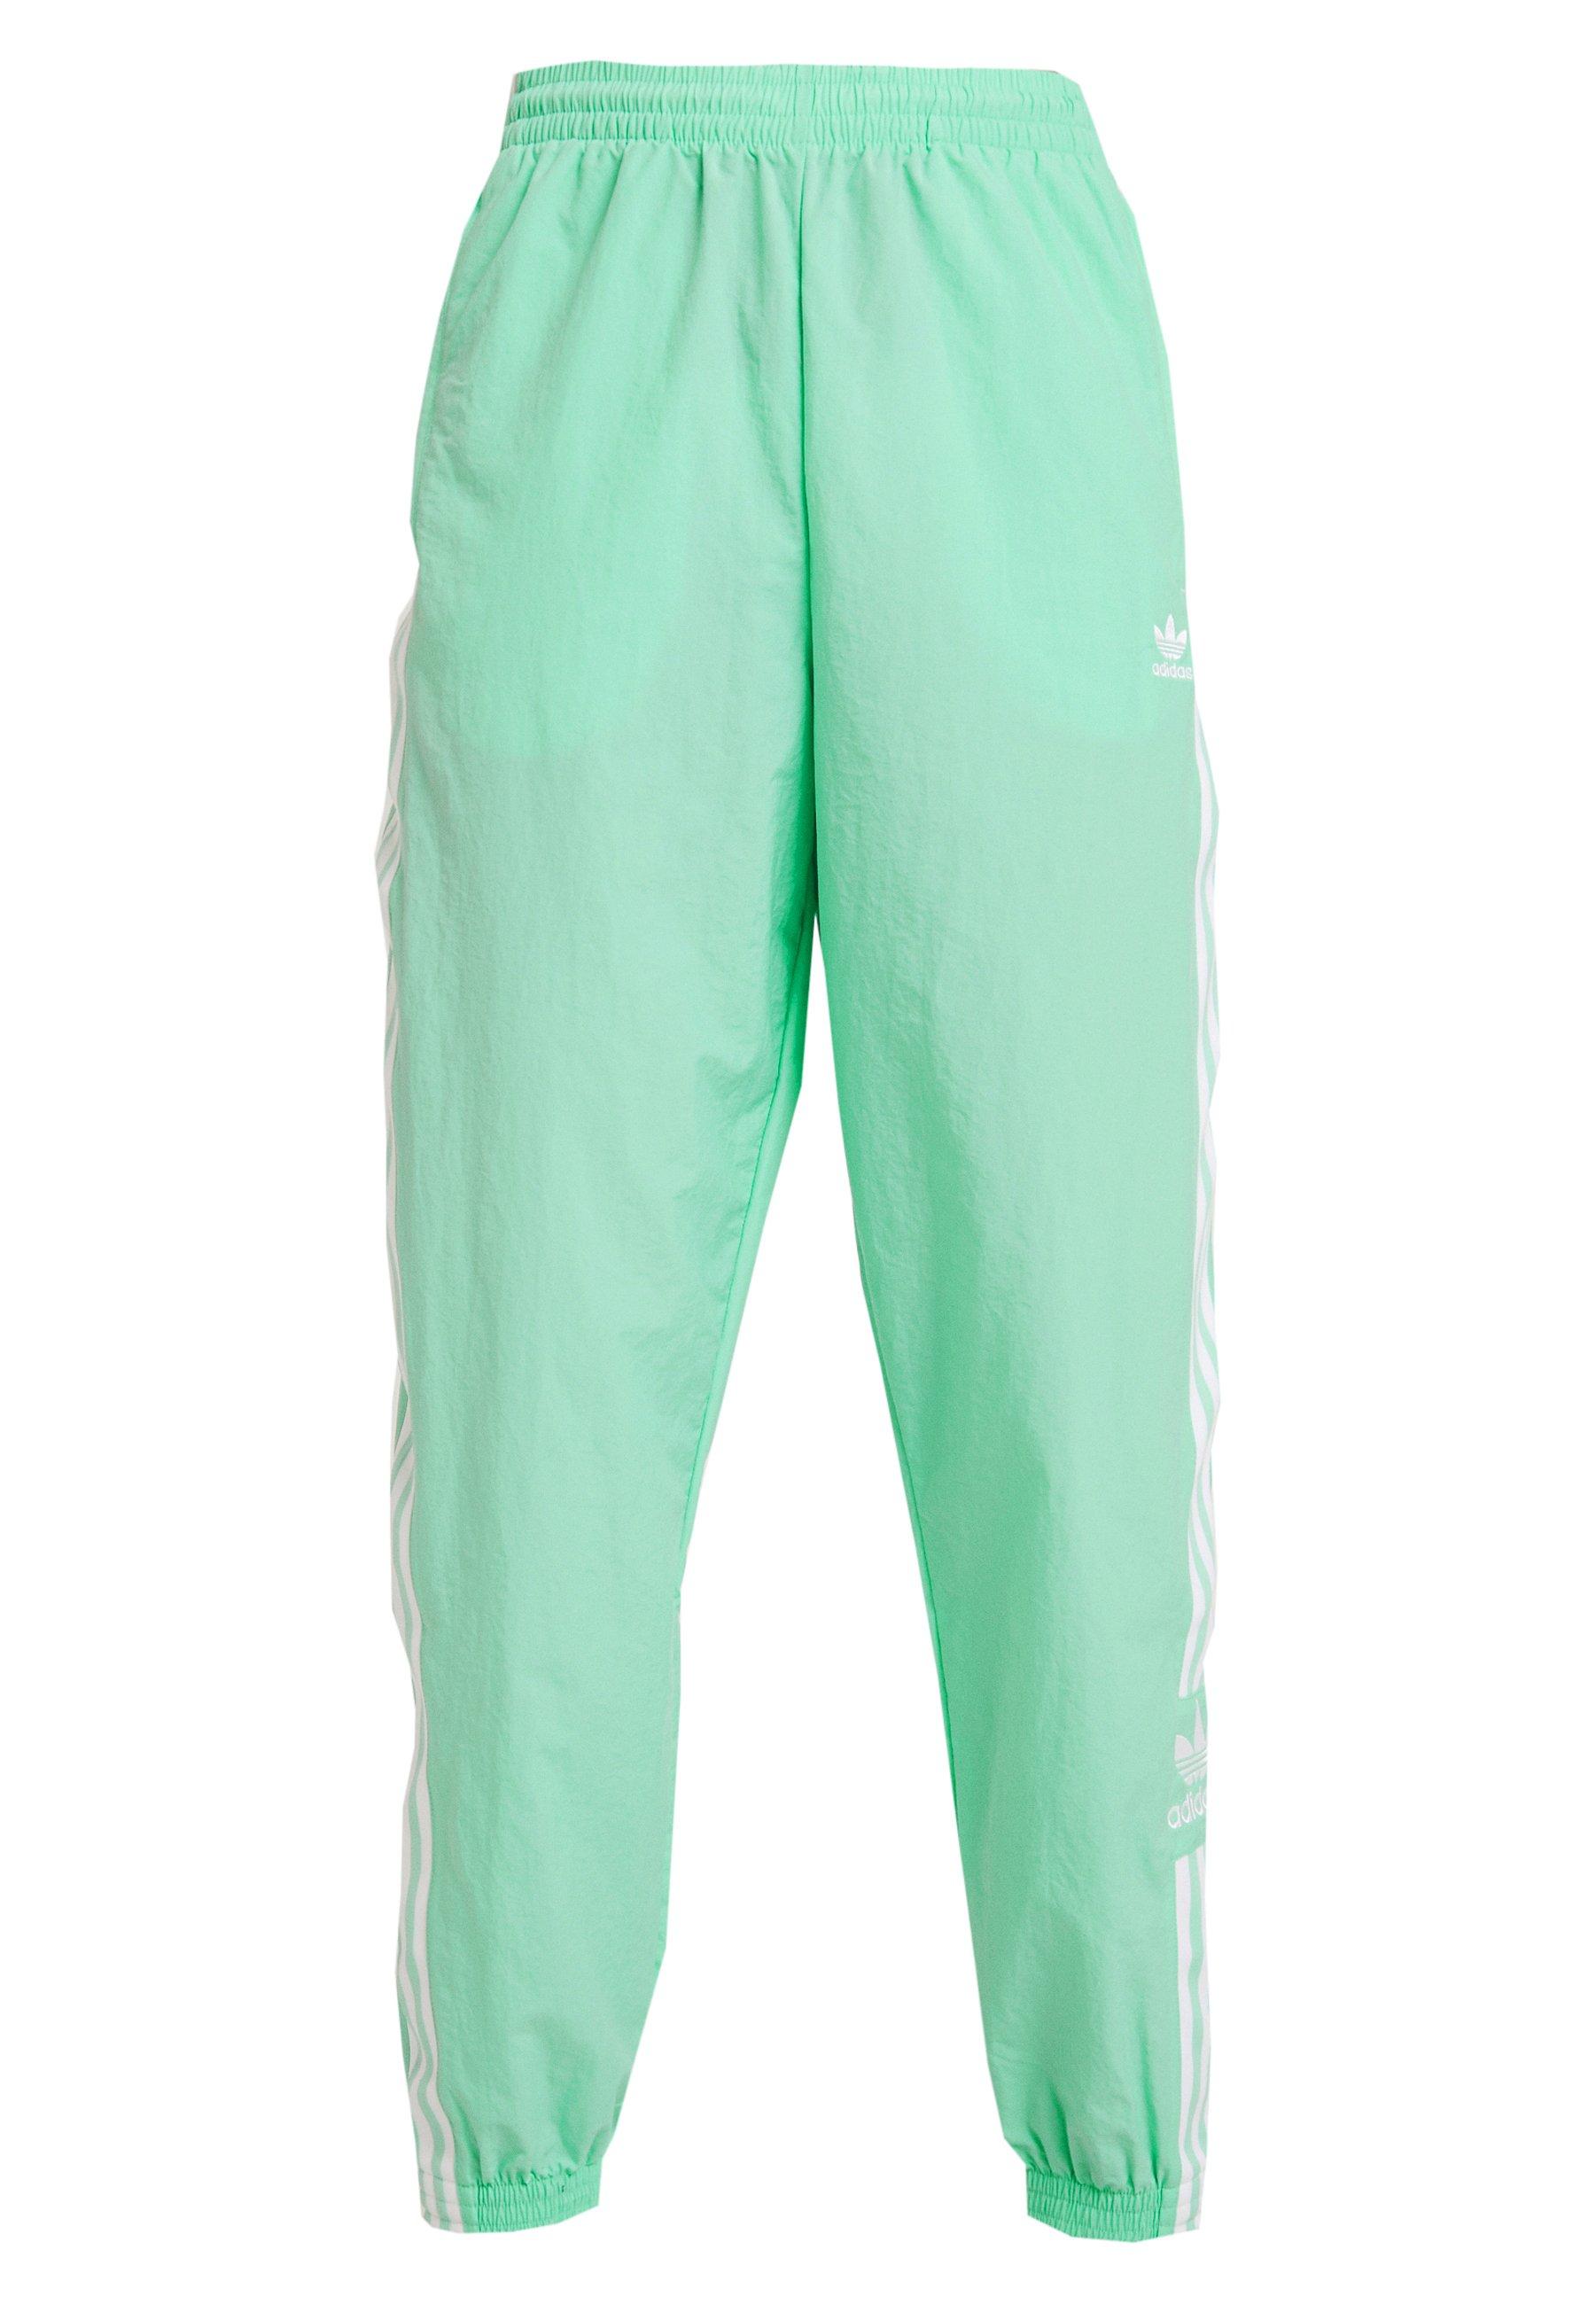 adidas Originals LOCK UP ADICOLOR NYLON TRACK PANTS